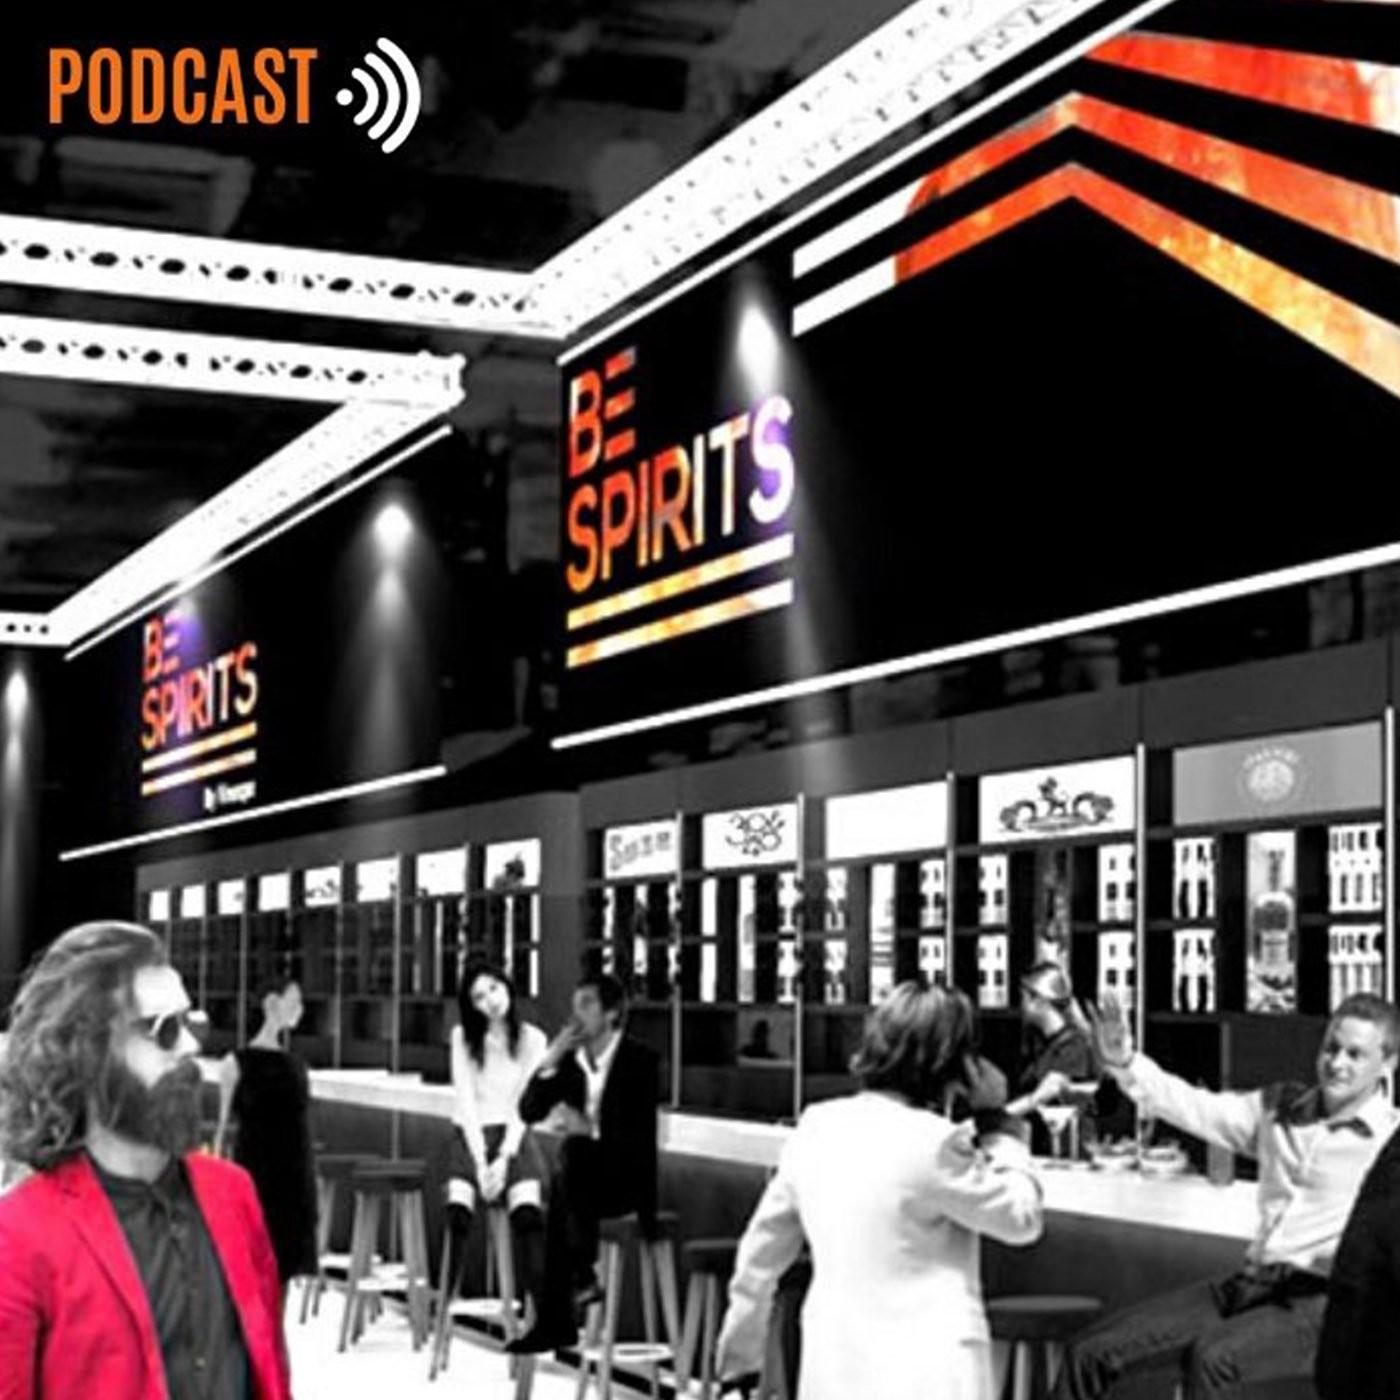 Podcast Infosbar Inside #24 - Be Spirits by Vinexpo - Part 3